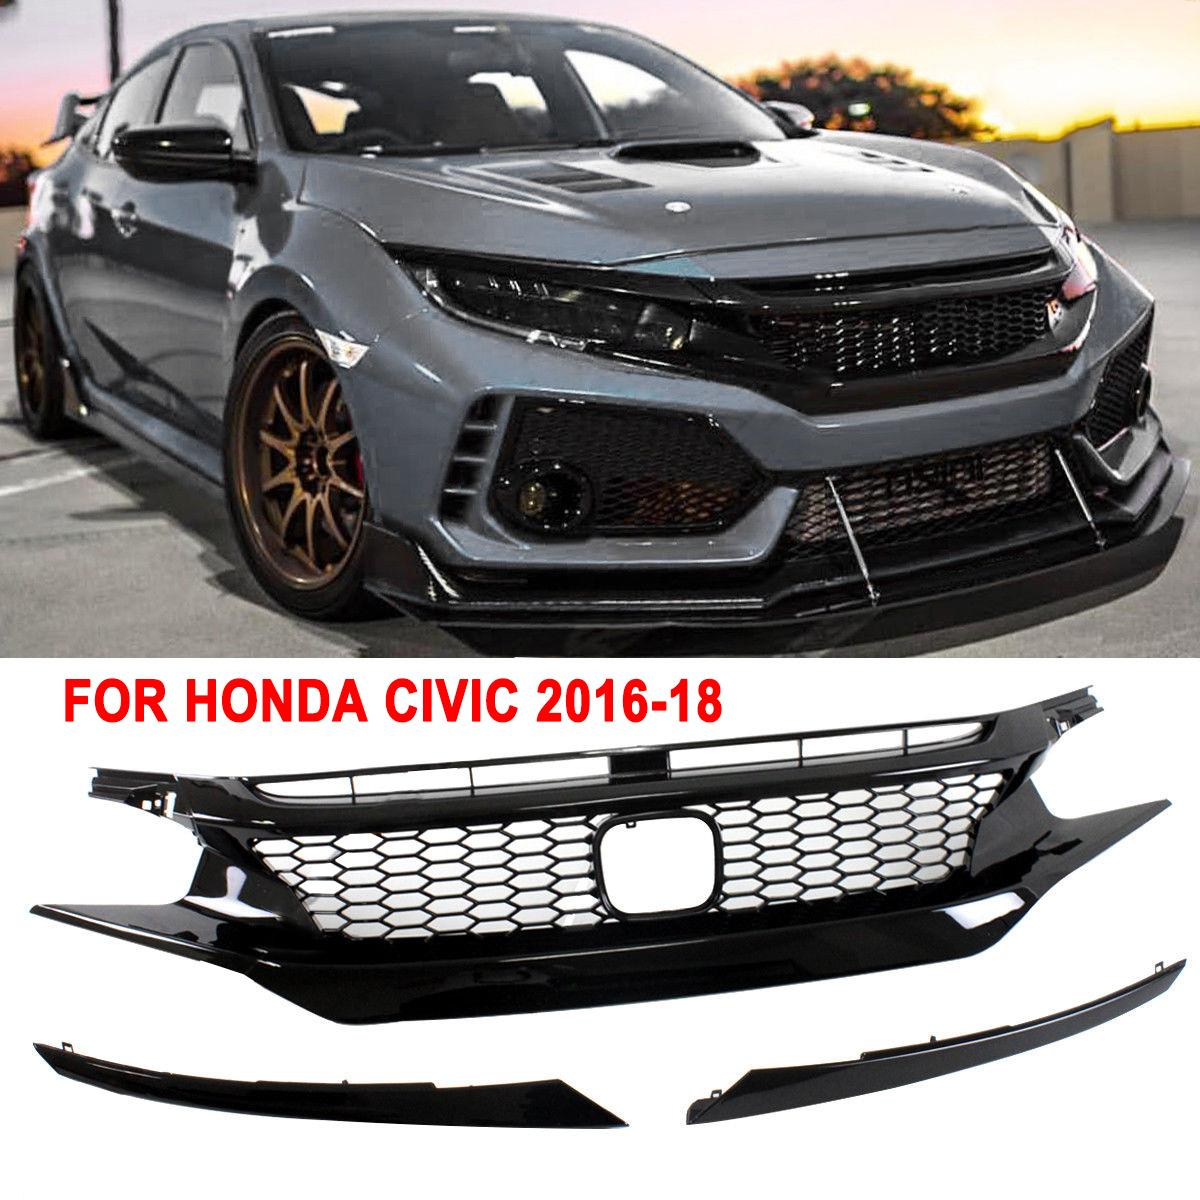 Yeni yedek parça Honda Civic için 2016 2017 2018 2019 10th Gen JDM-CTR stil parlak siyah Mesh ön kaput ızgara